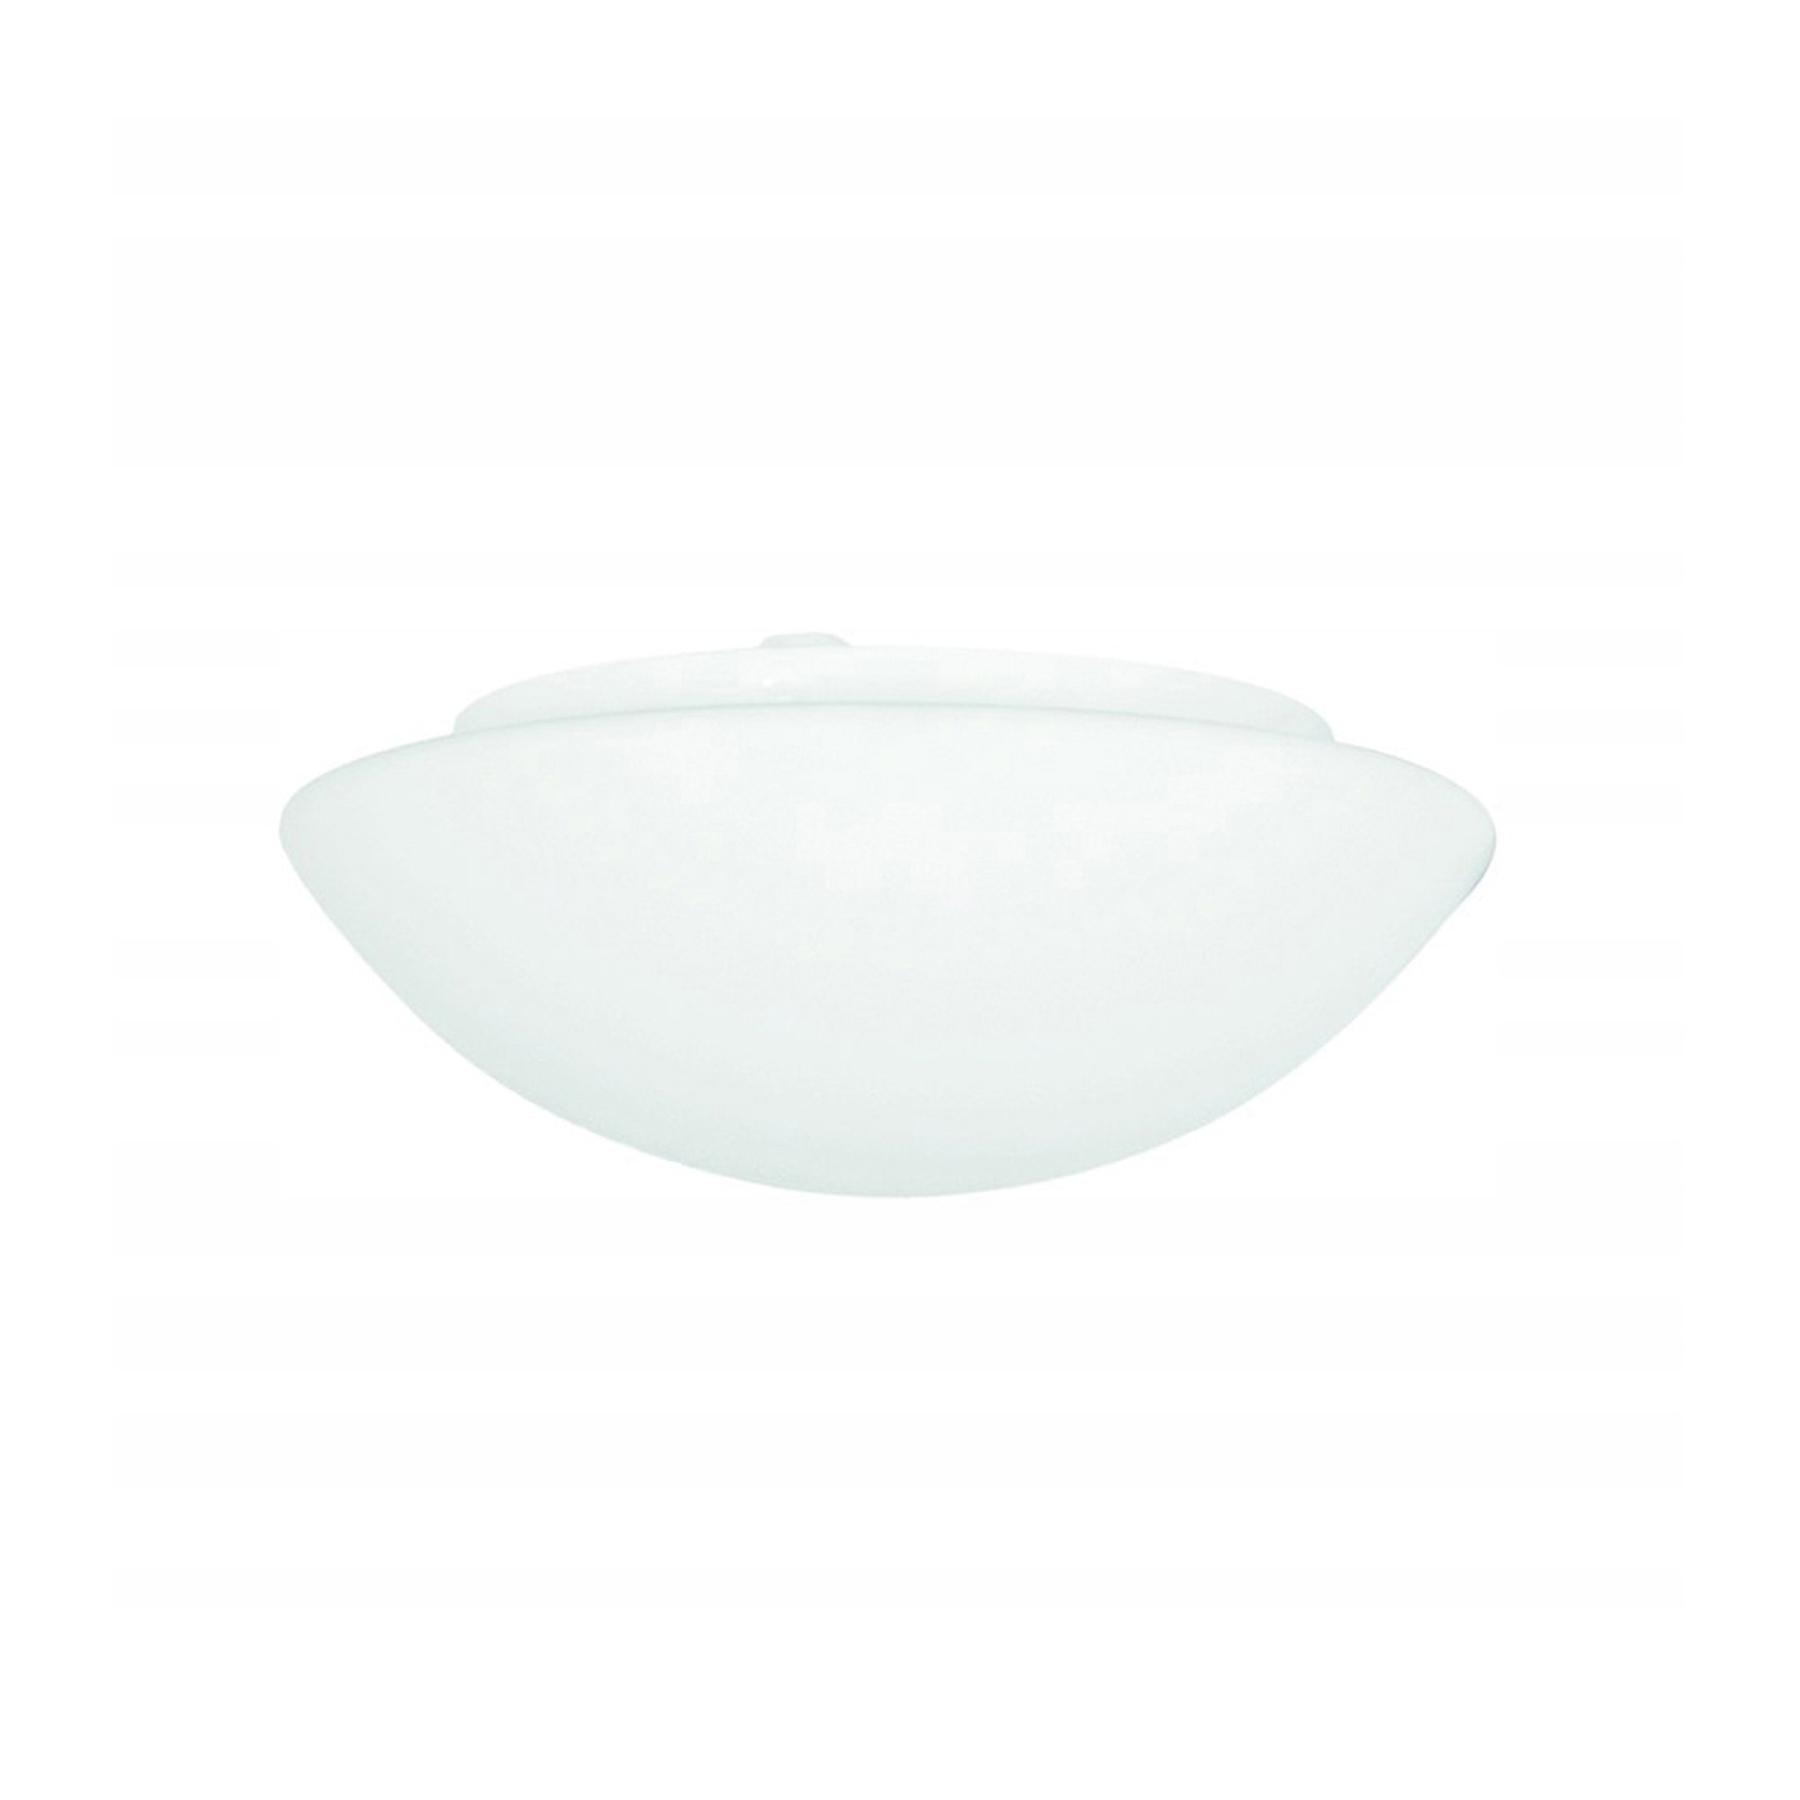 Kylpyhuoneen kattolamppu Twister, Ø 30 cm, 1x60 W